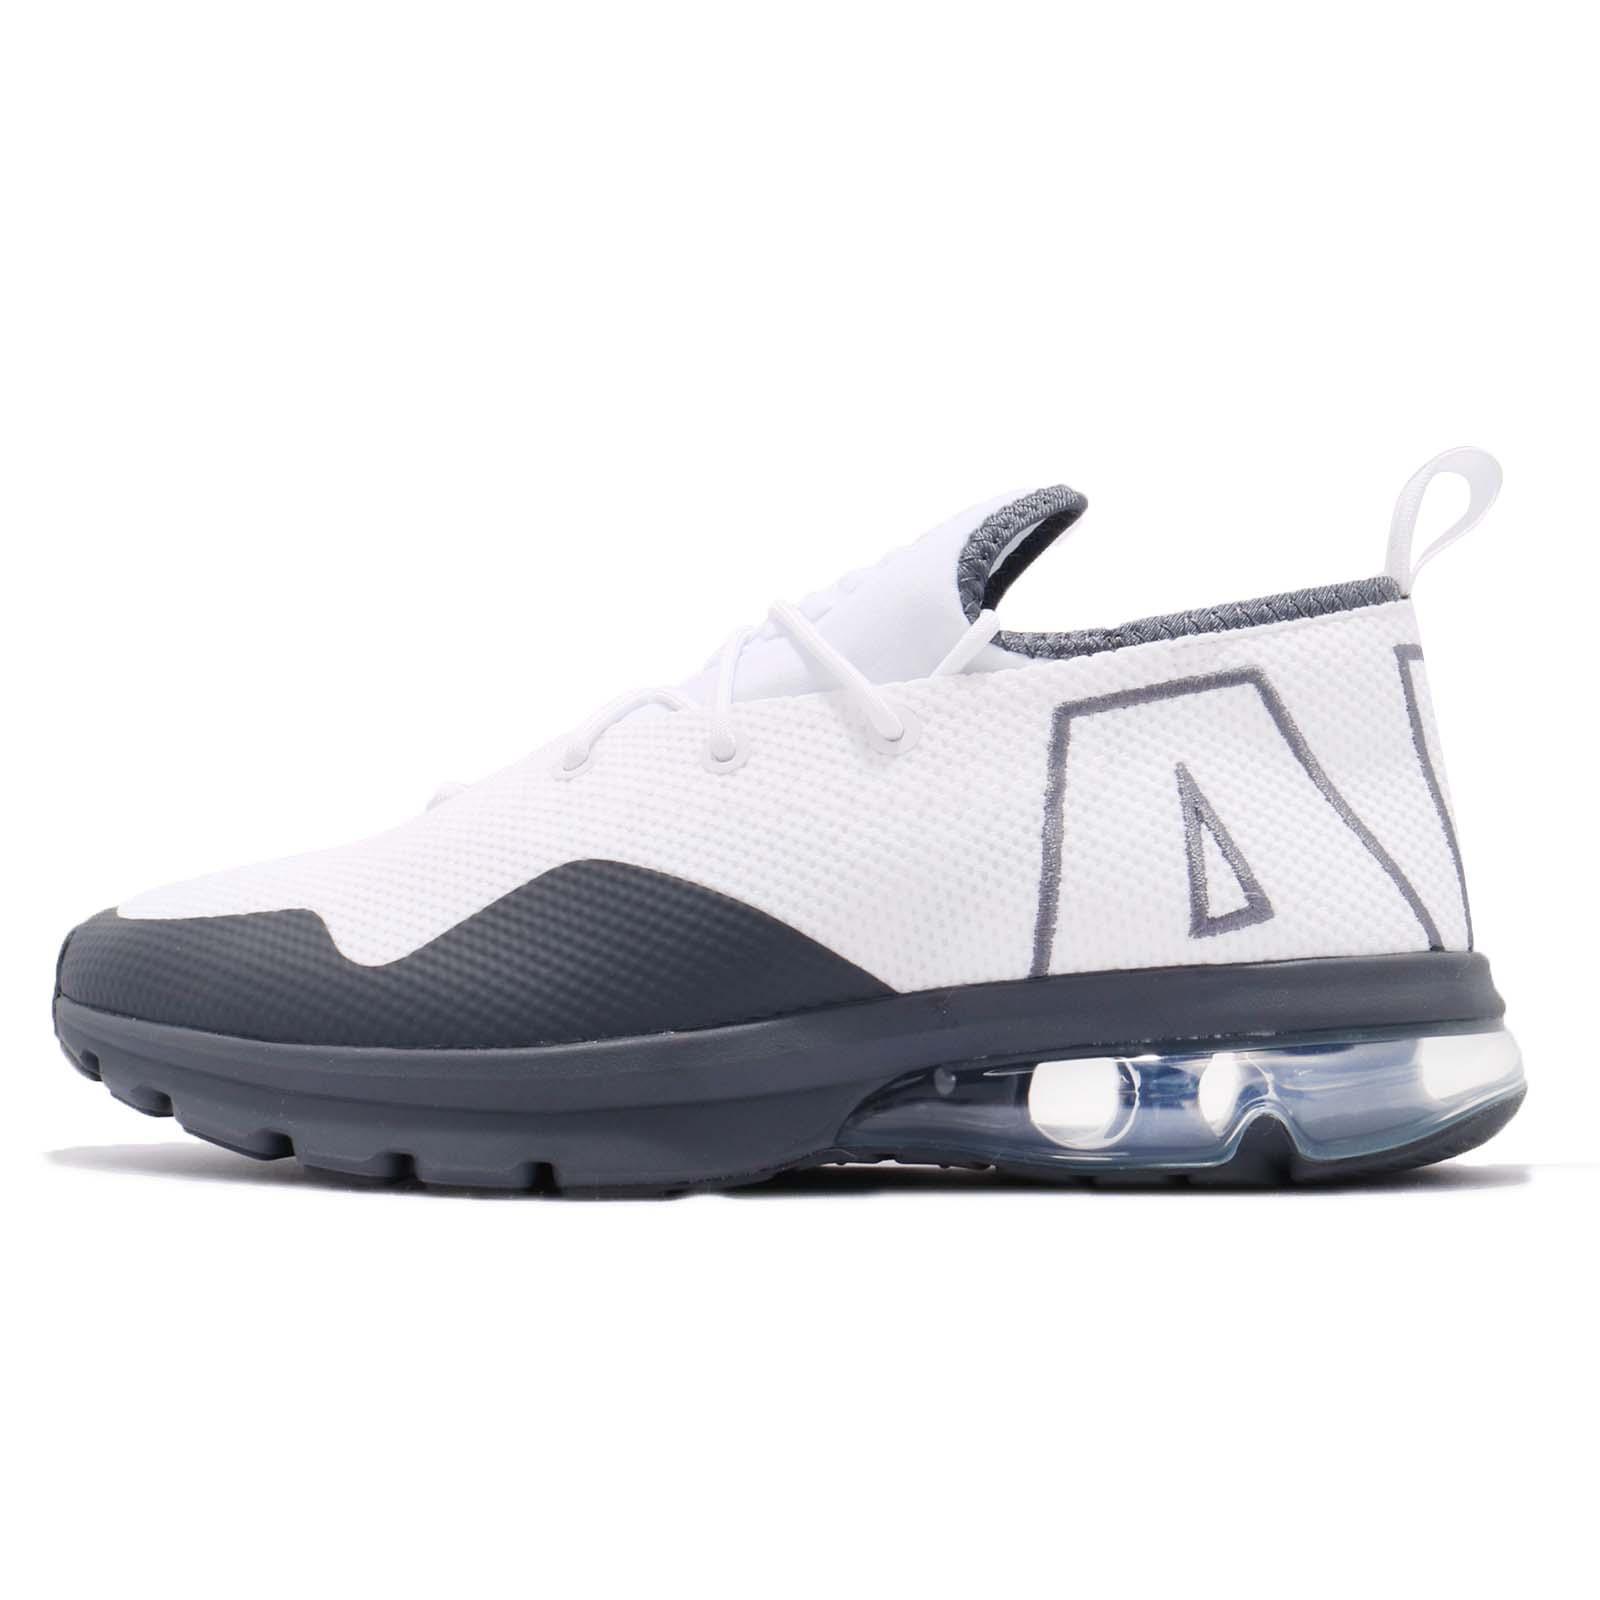 sale retailer 59311 67f05 Nike Air Max Flair 50 White Dark Silver Men Running Shoes Sneakers AA3824- 100